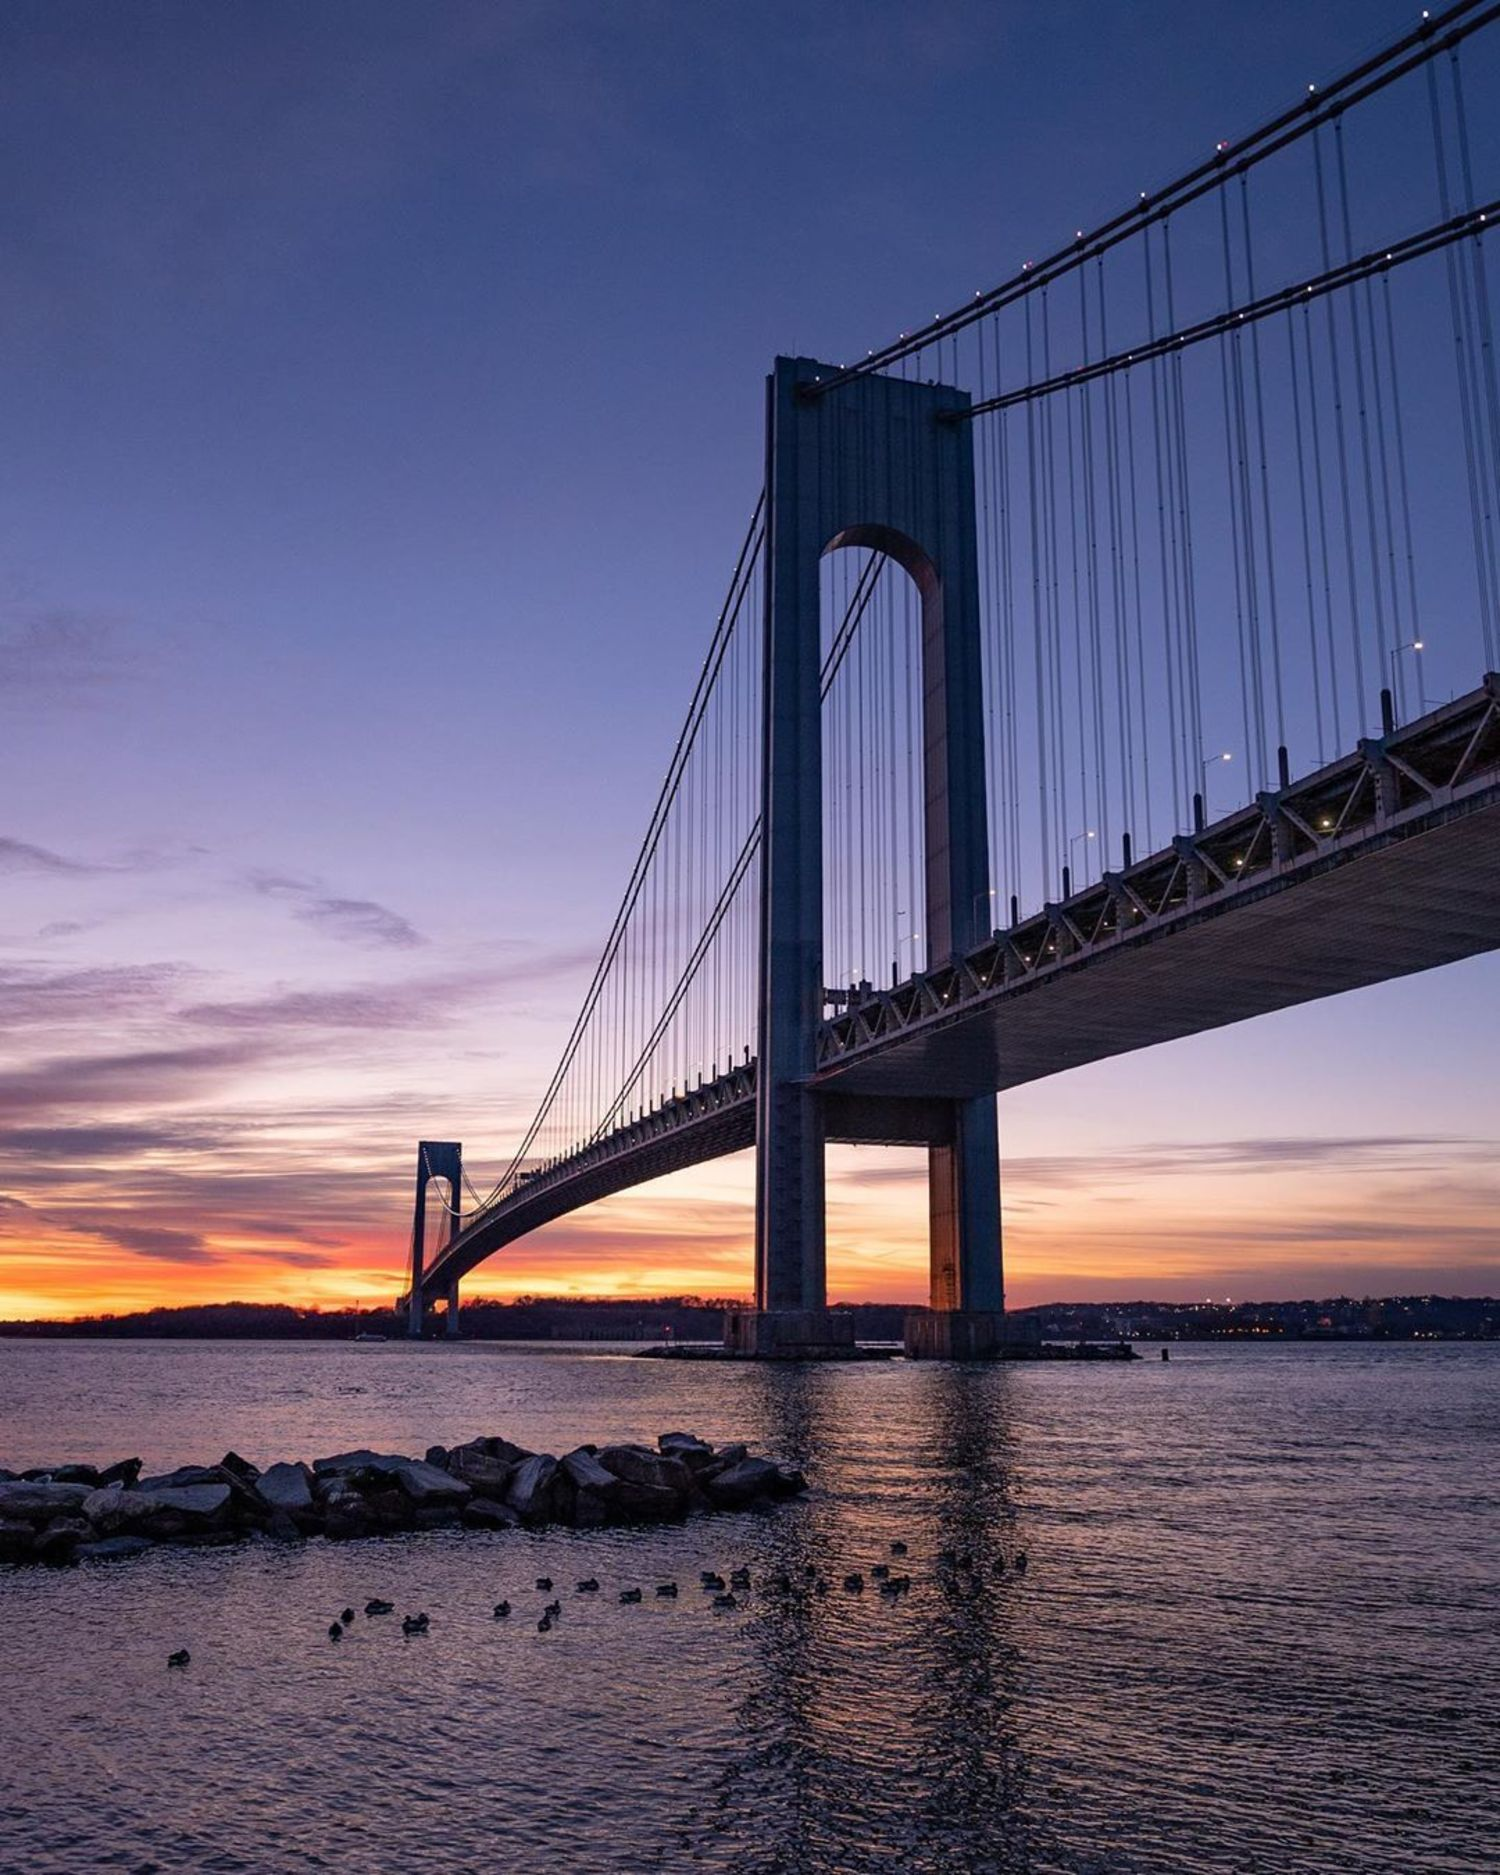 Verrazzano-Narrows Bridge, Brooklyn—Staten Island, New York